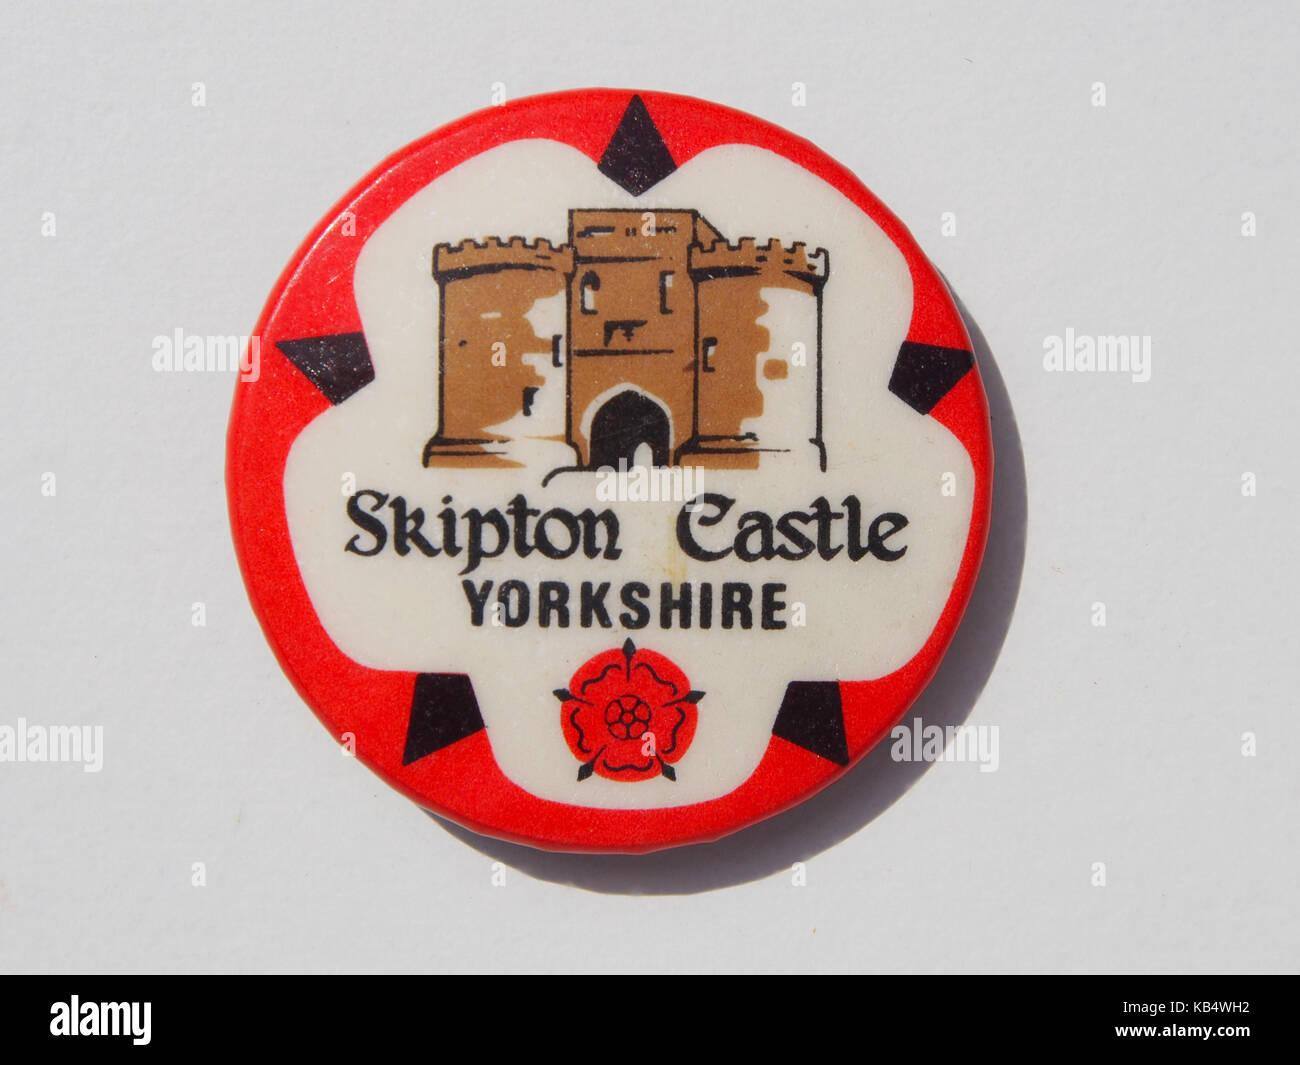 Yorkshire dating website